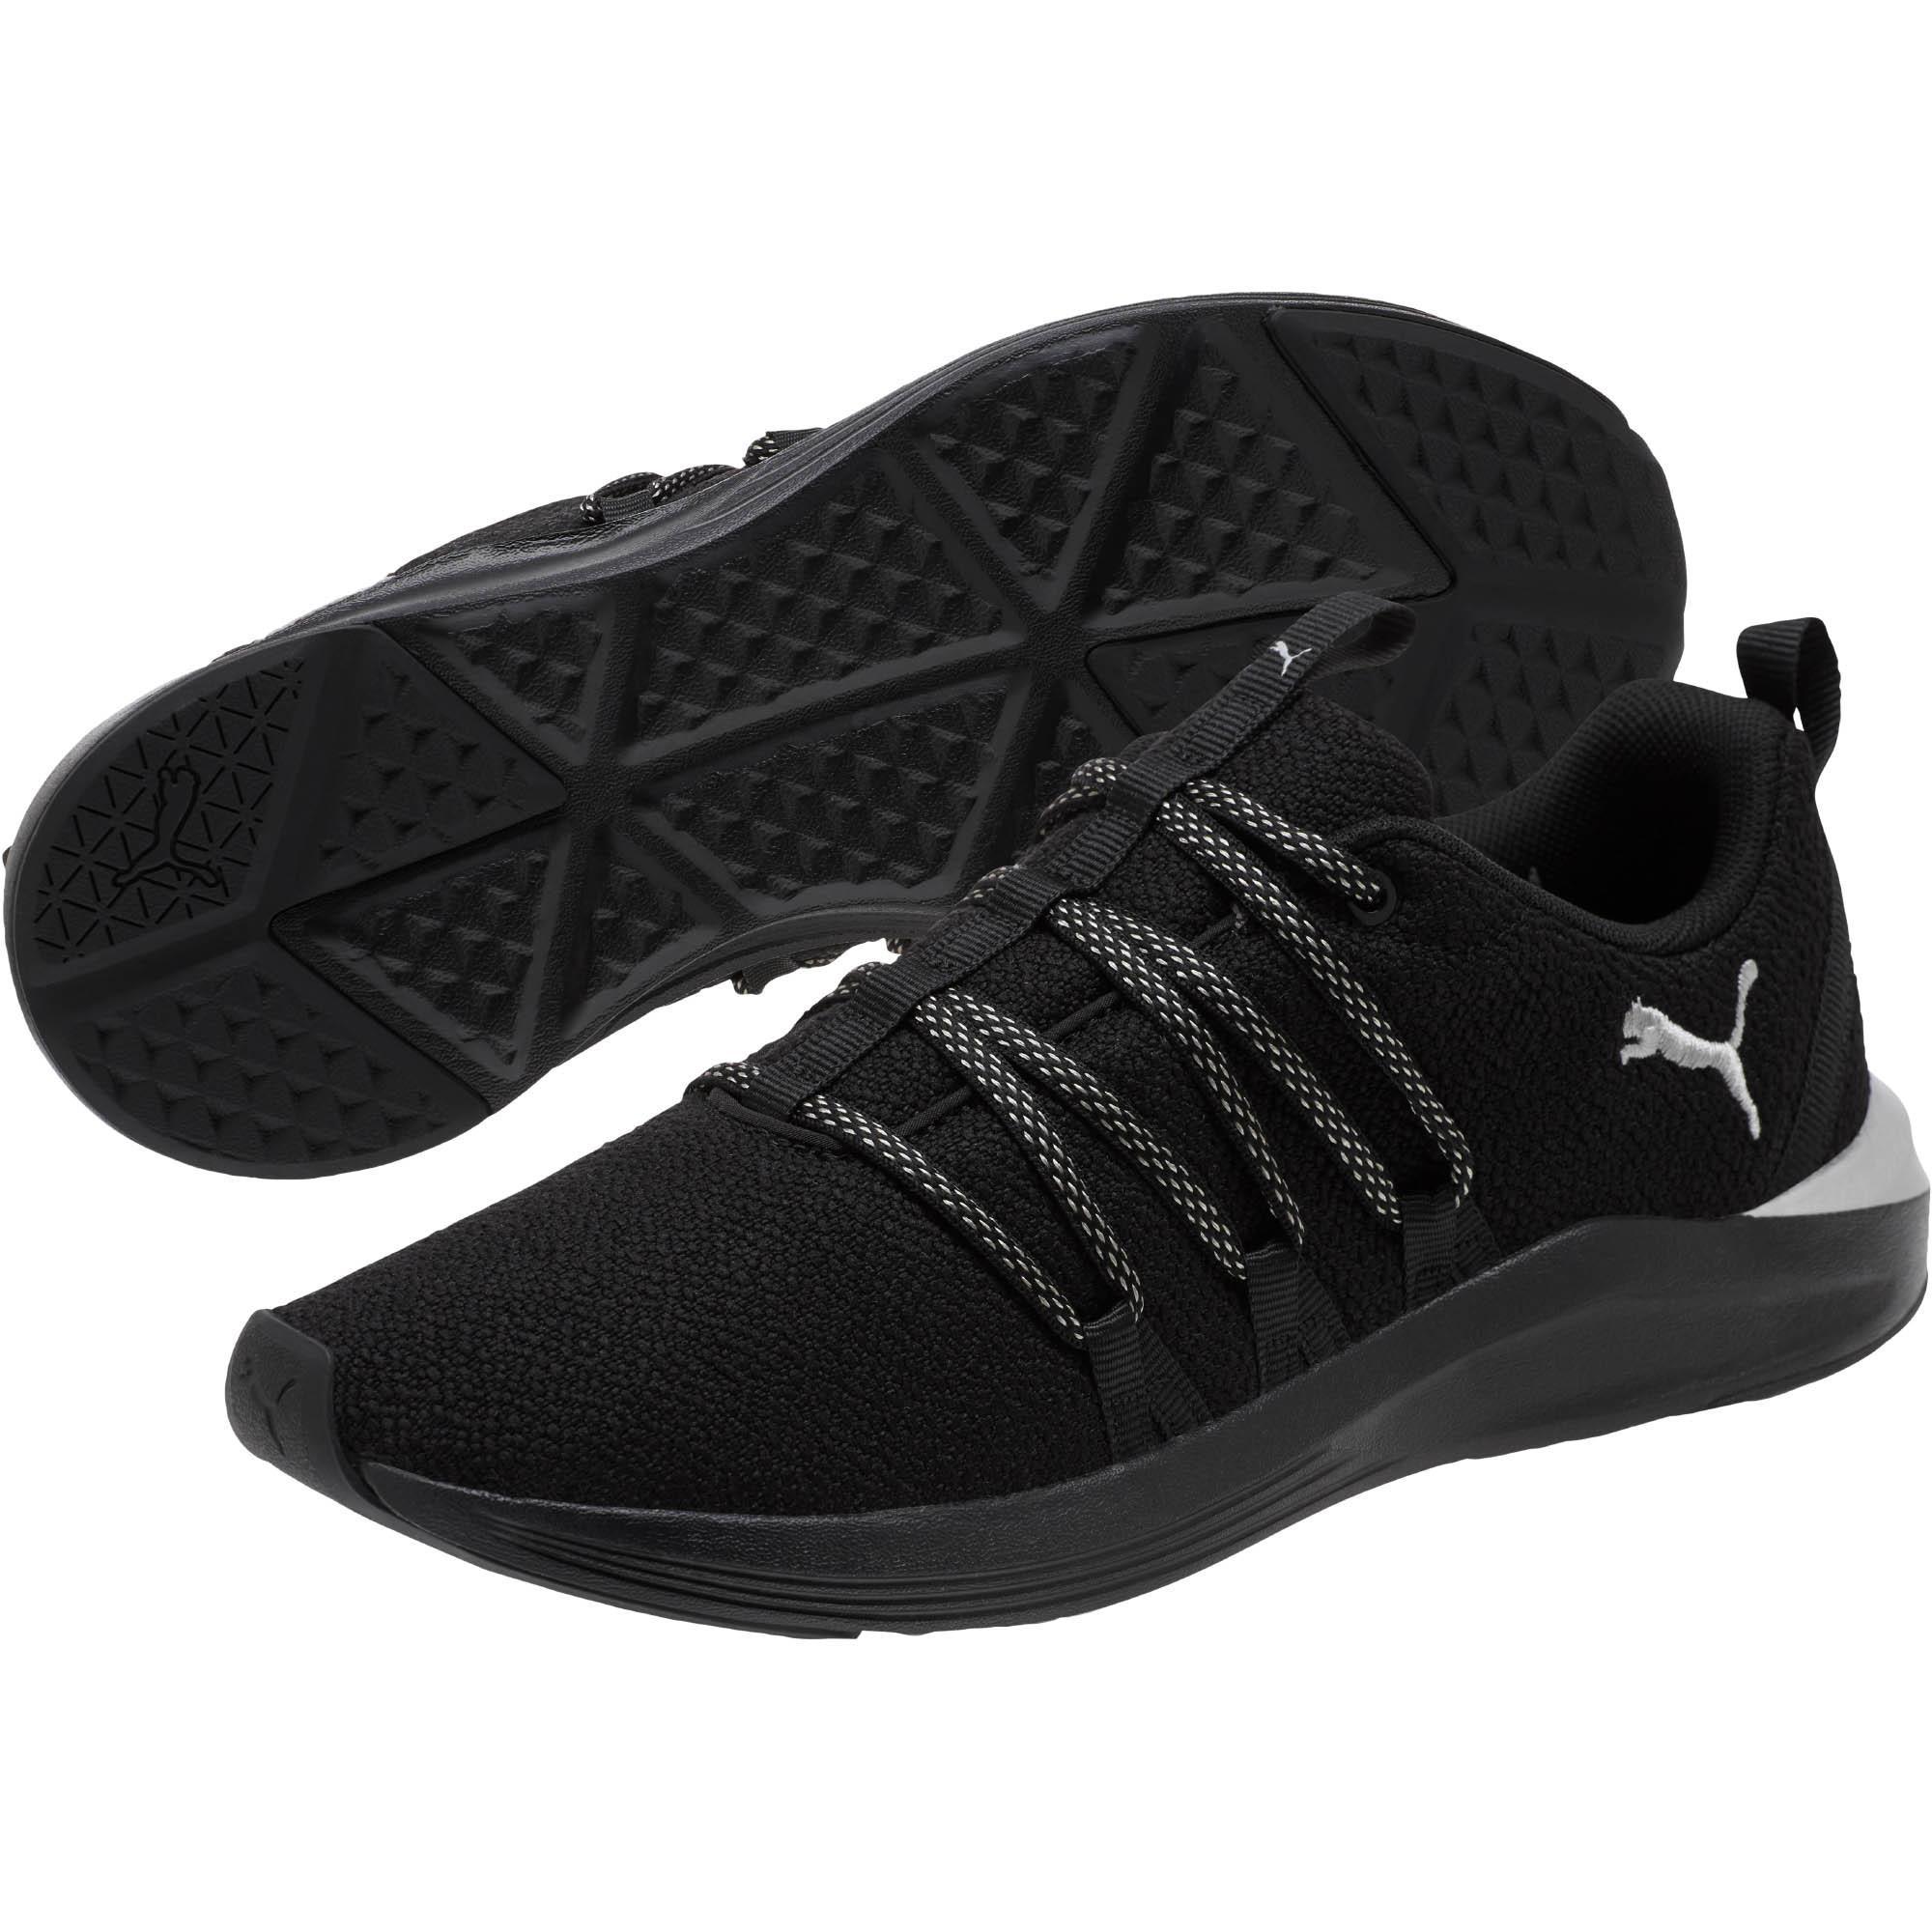 PUMA - Black Prowl Alt Prem Mesh Women s Sneakers - Lyst. View fullscreen 1eba69b5c